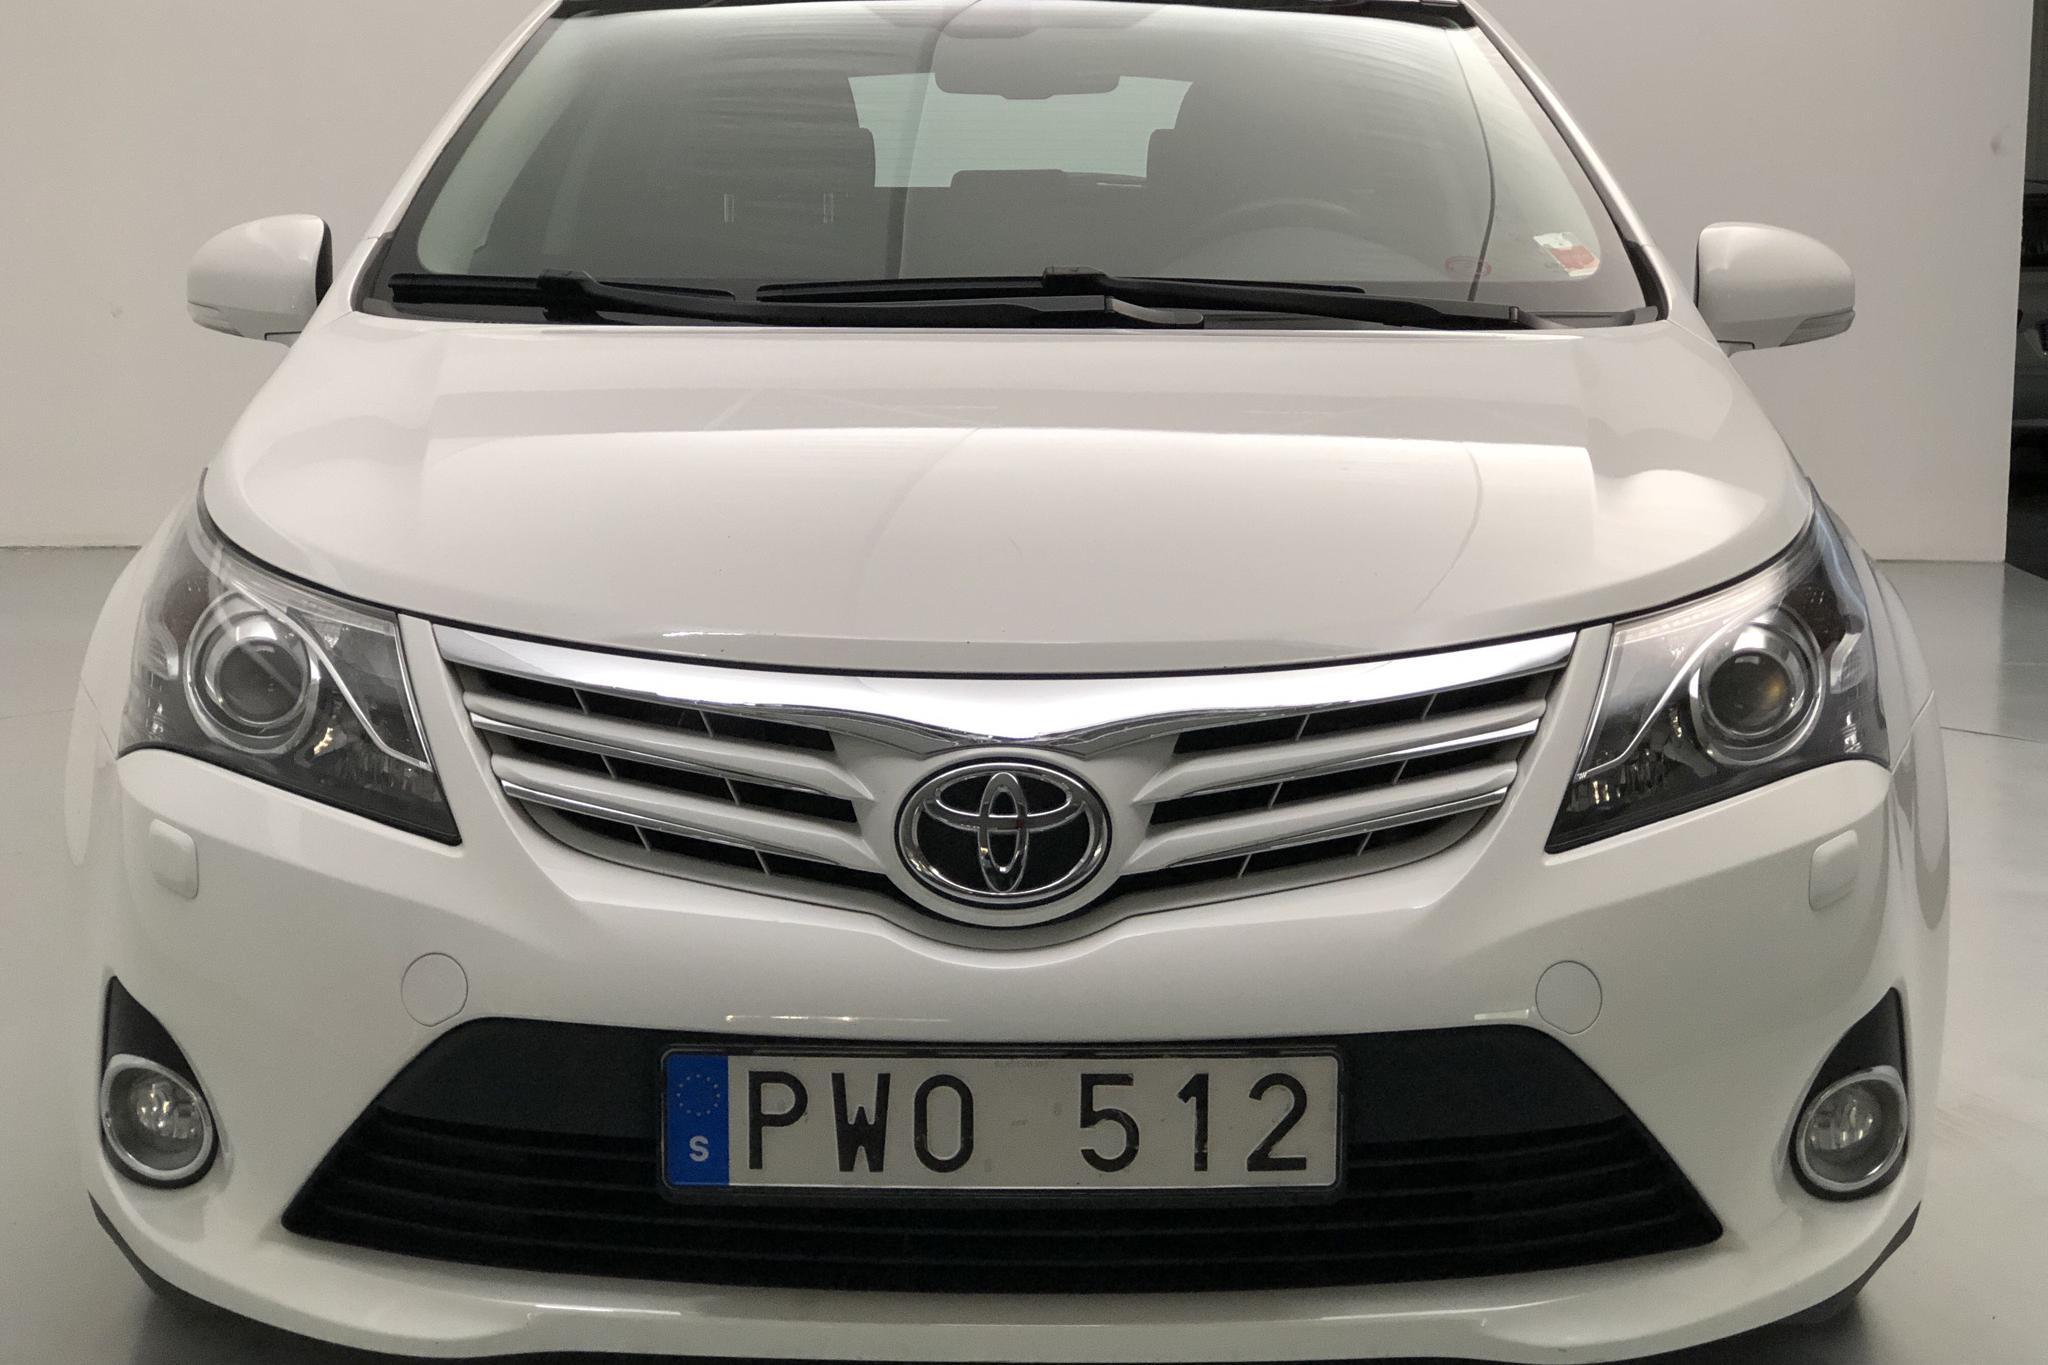 Toyota Avensis 1.8 Kombi (147hk) - 76 970 km - Automatic - white - 2013